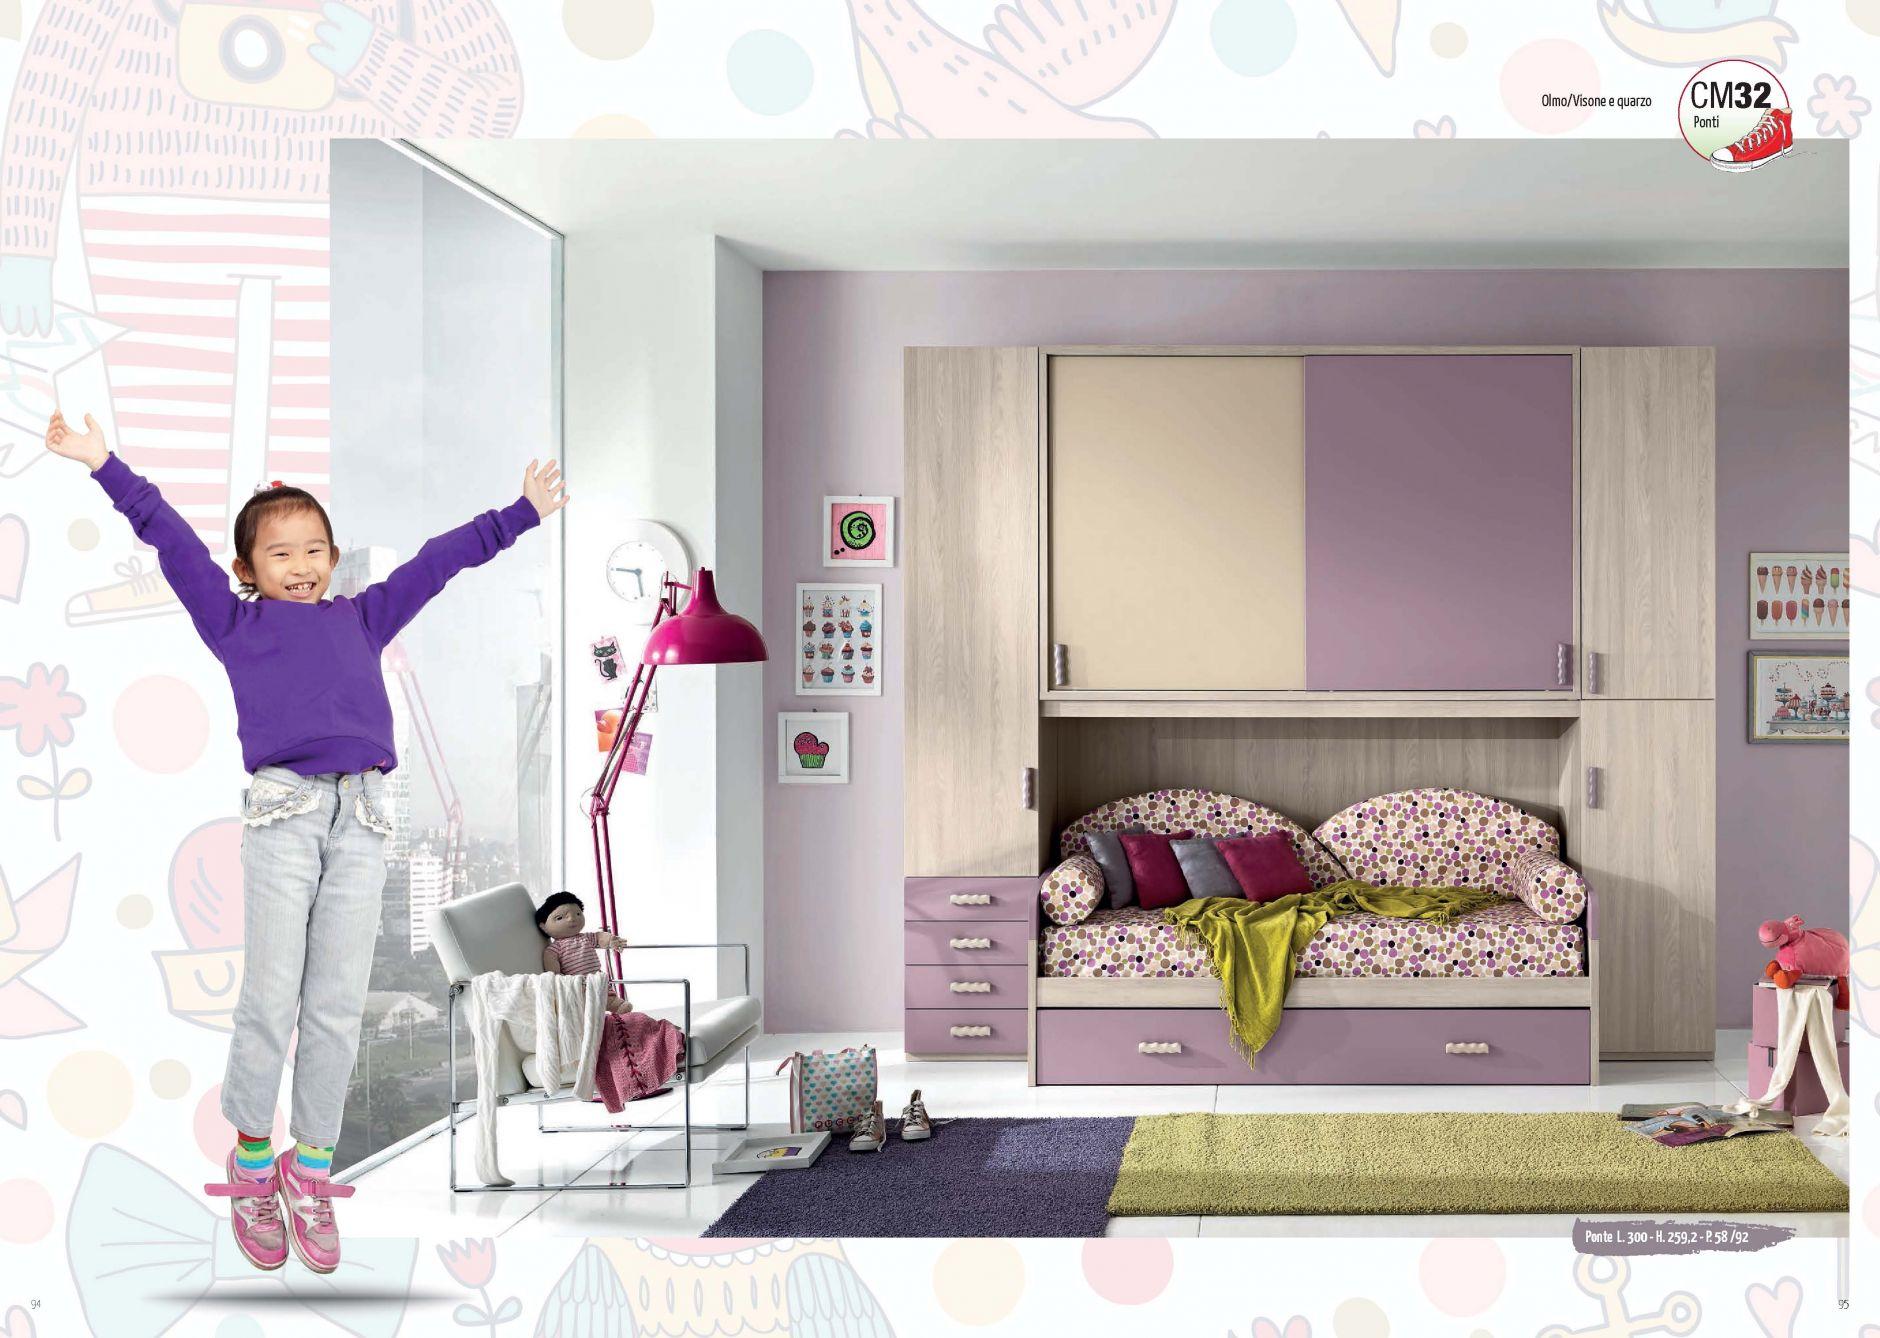 Muebles De Los Ni Os Muebles Giessegi Composici N Sm32  # Giessegi Muebles Infantil